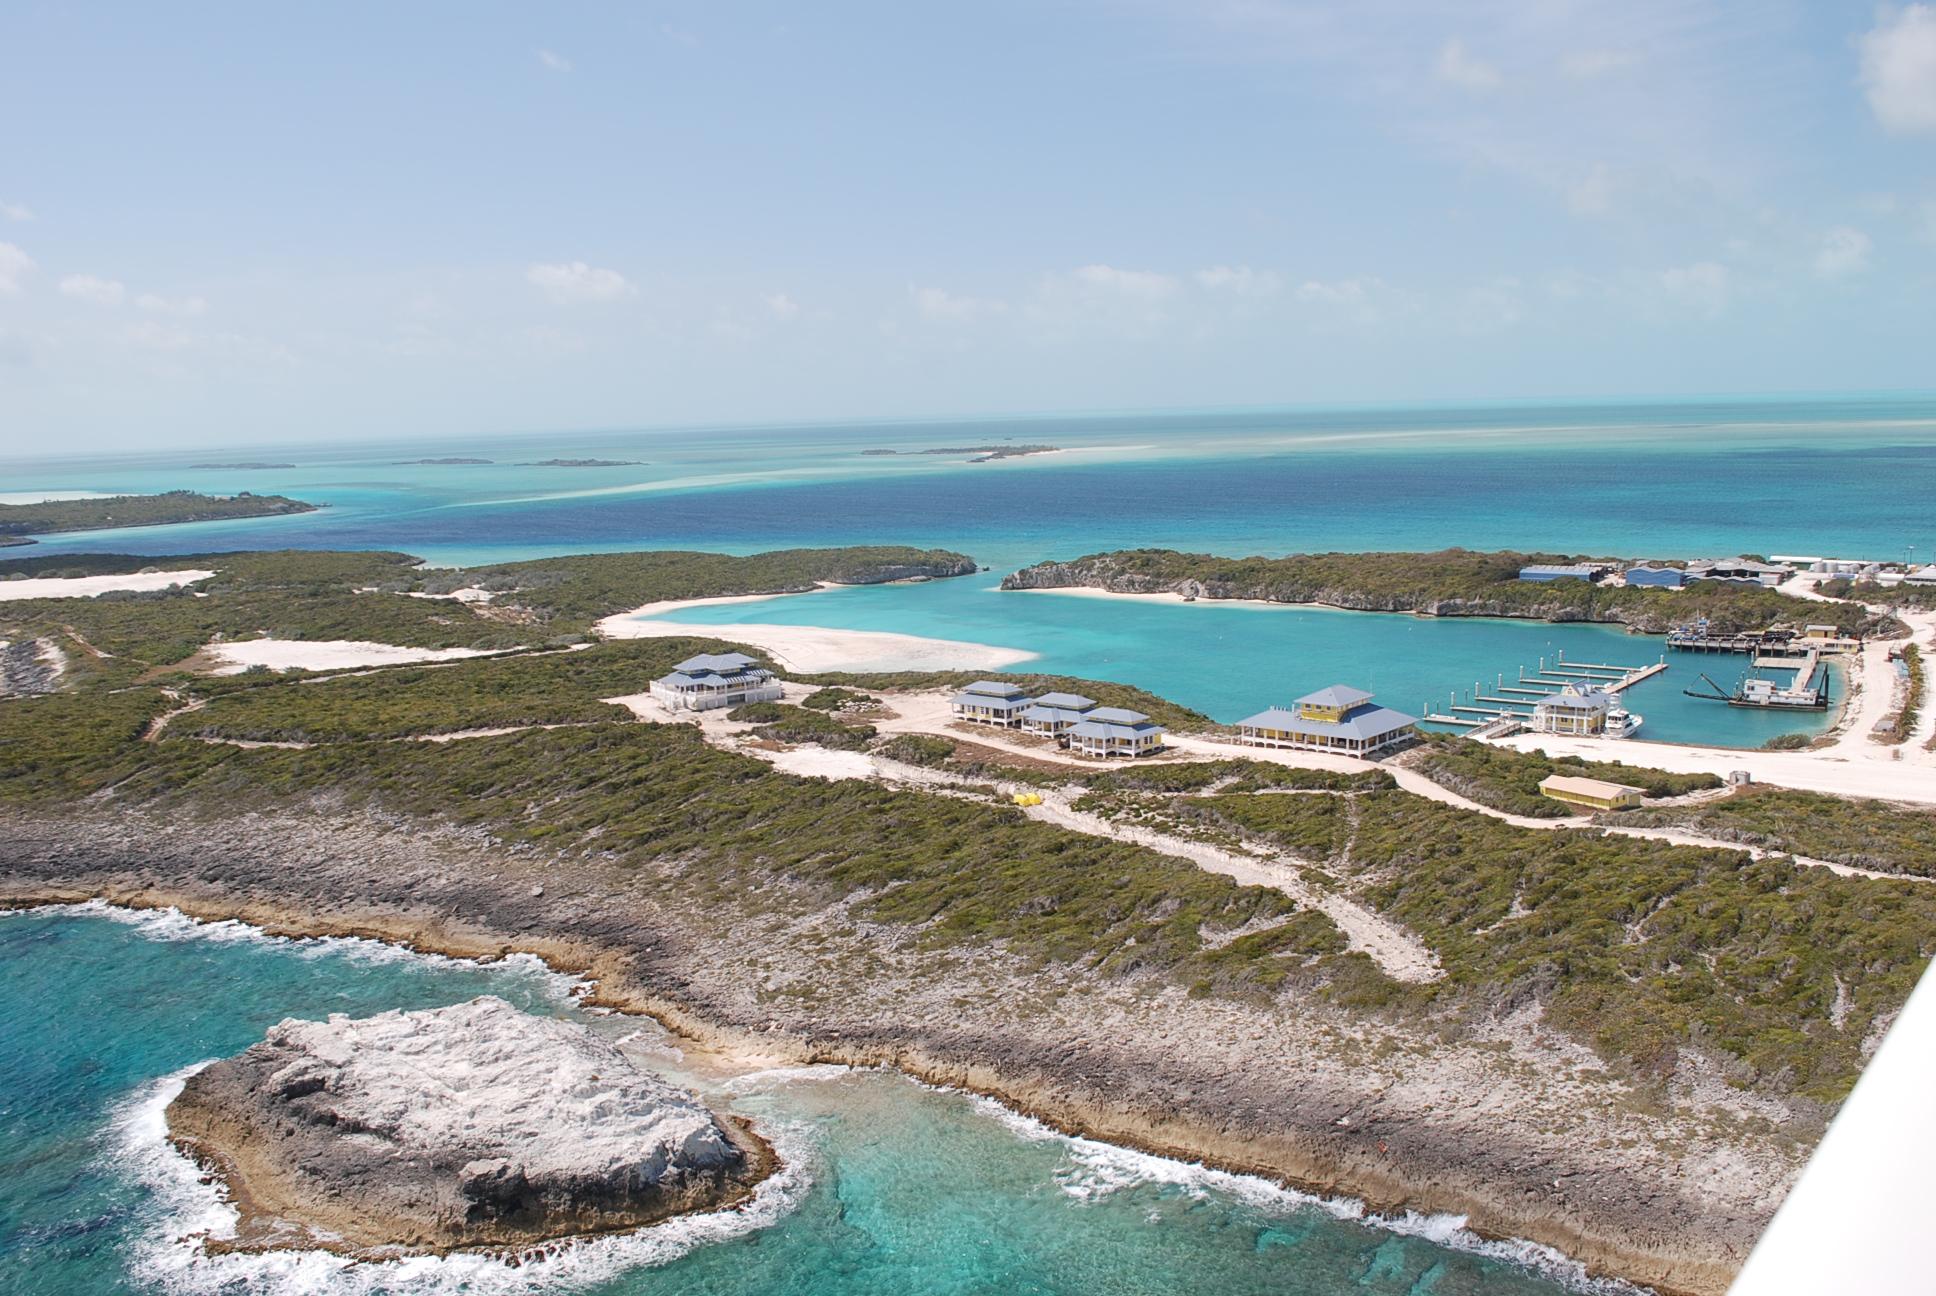 Ilha das Bahamas